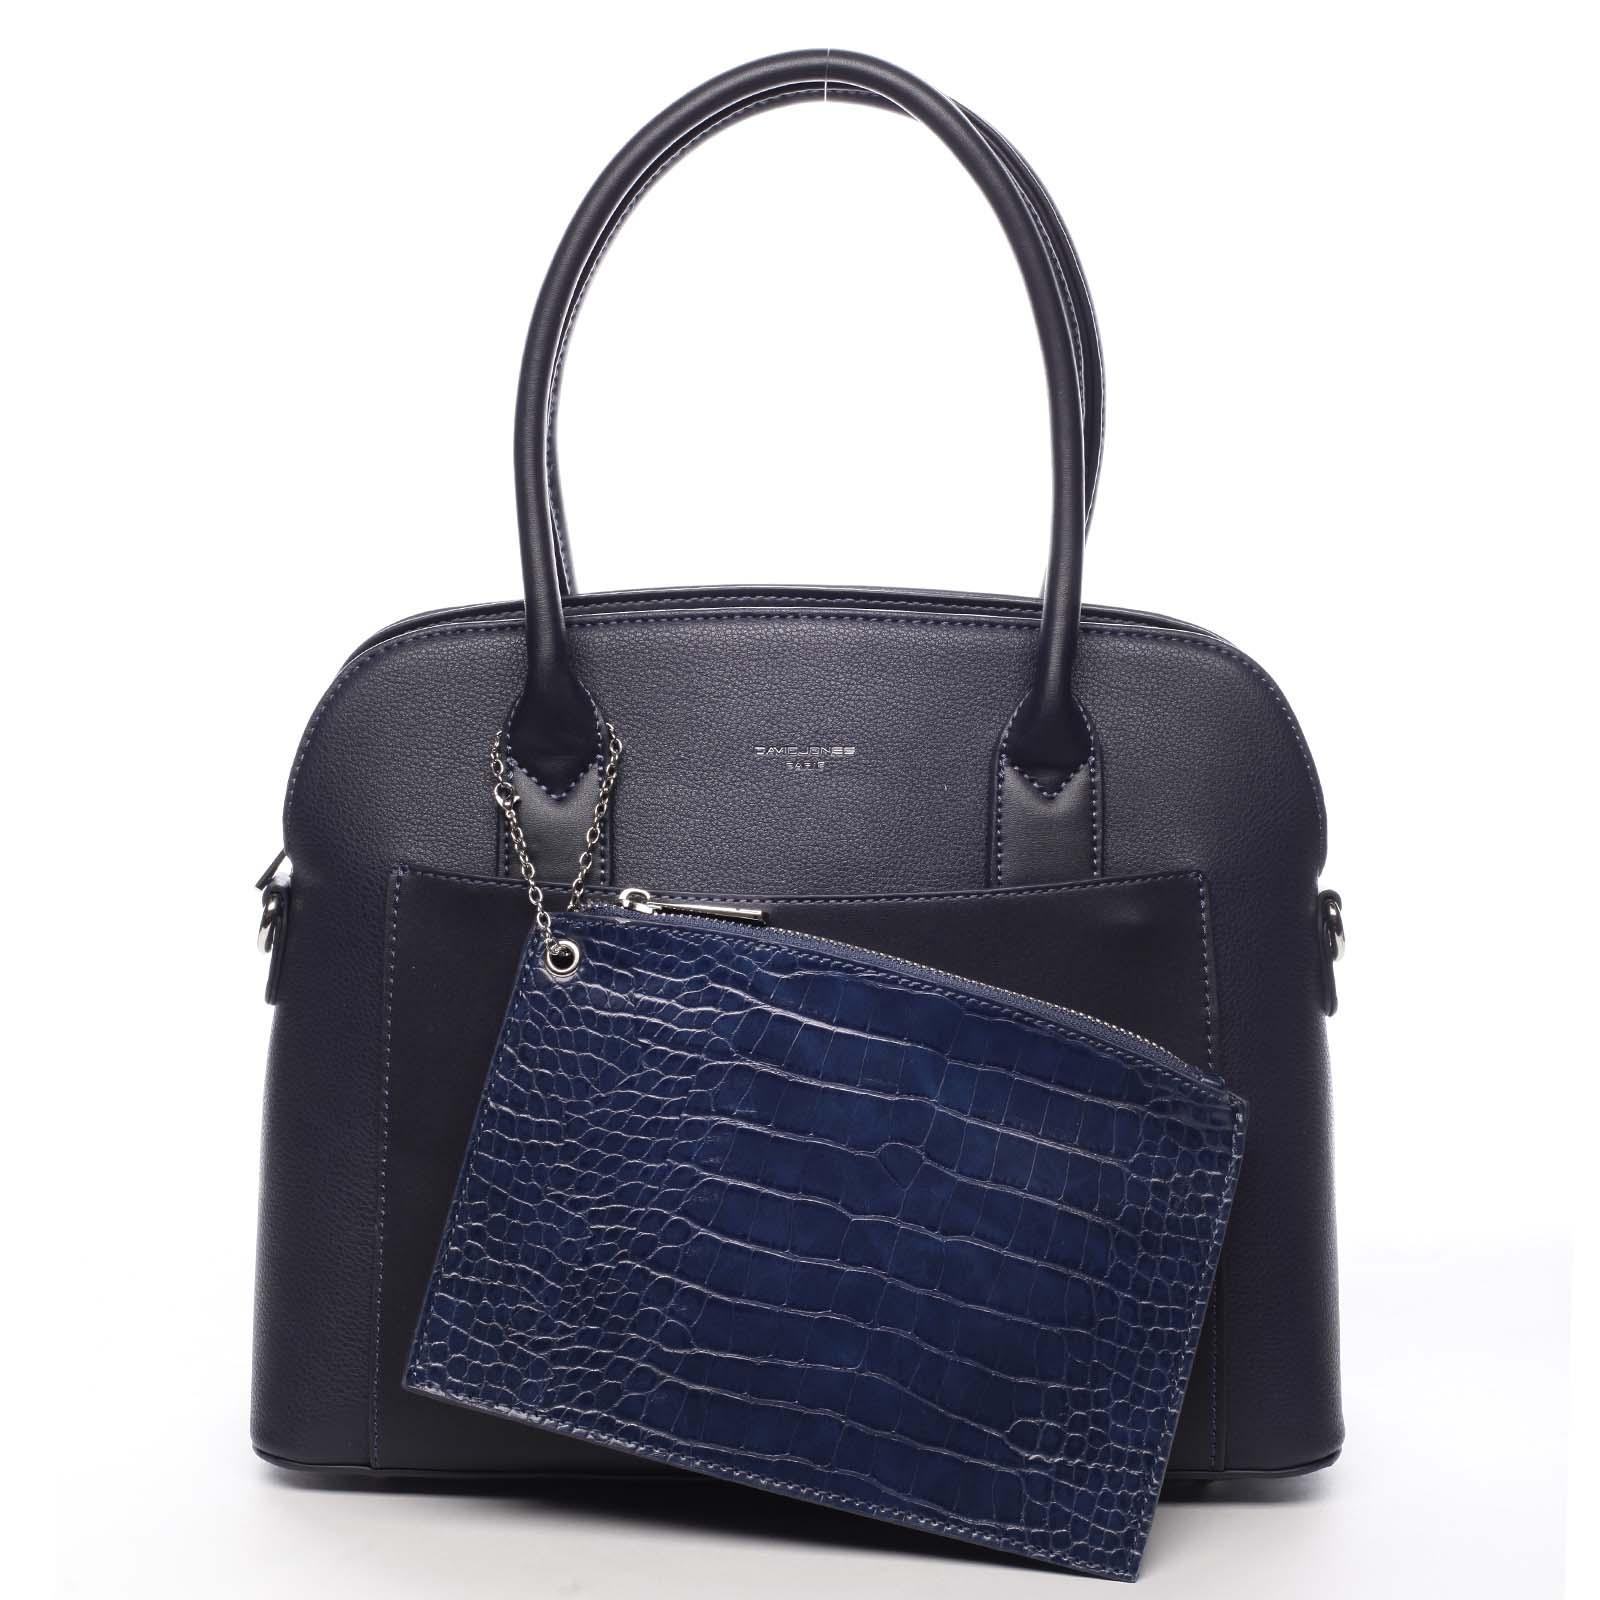 Dámská kabelka tmavě modrá - David Jones Caleed